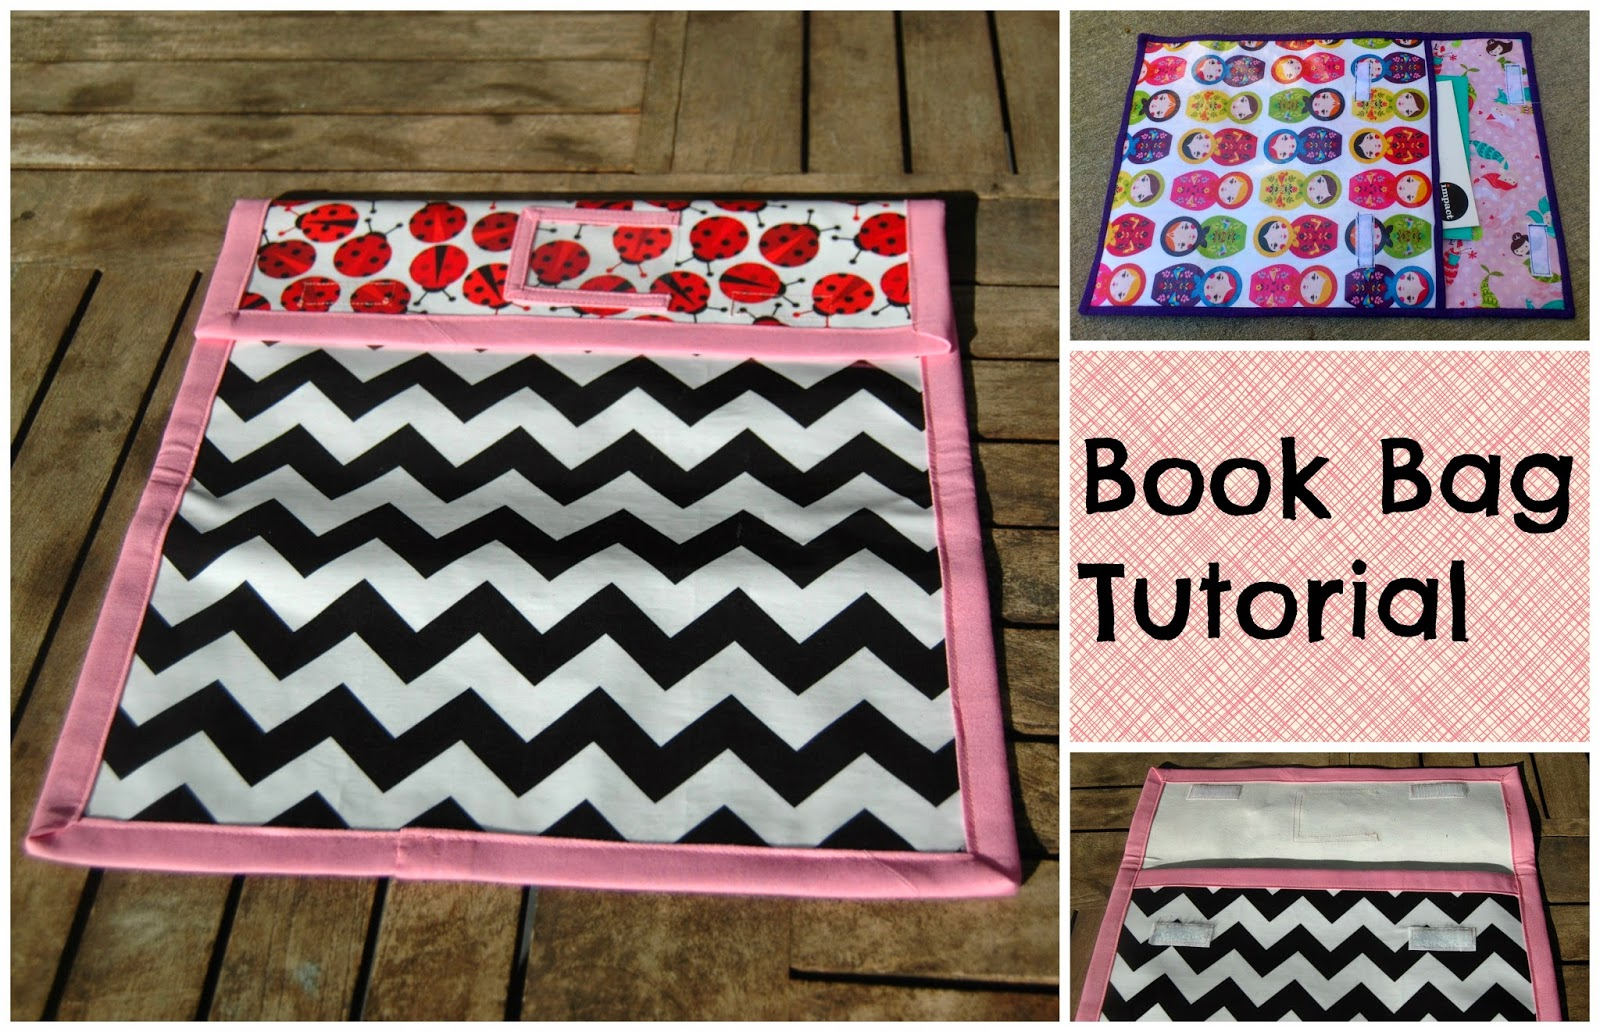 http://2.bp.blogspot.com/-Q3wq74tHFK4/U47QvR8ZbZI/AAAAAAAABog/xMNfgZLxeXA/s1600/book+bag+tute+cover.jpg